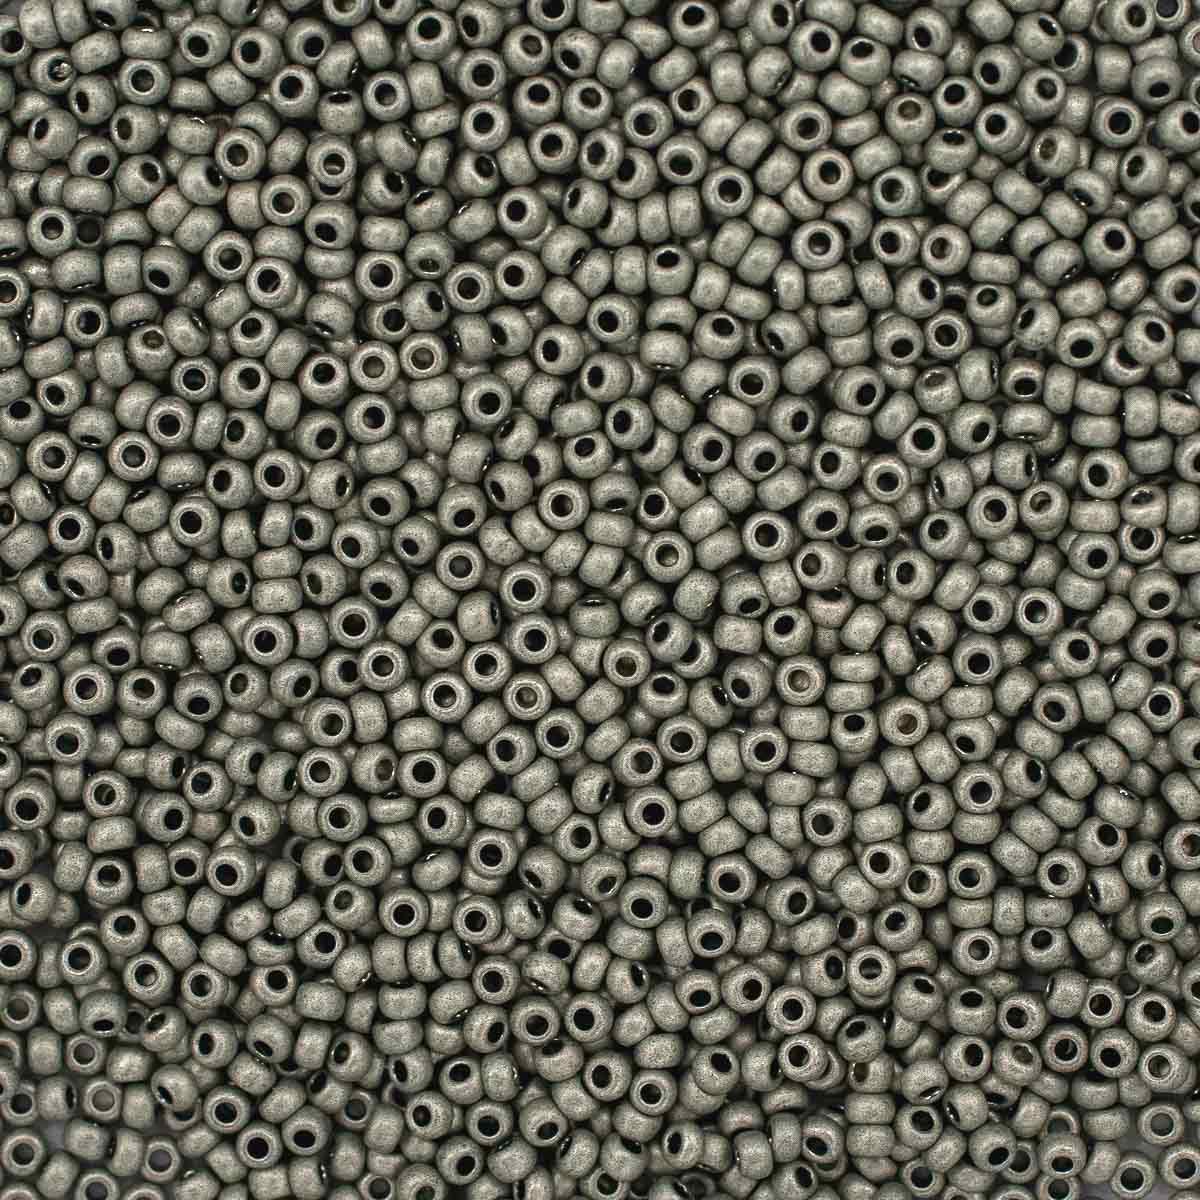 (18542) 331-39001-10/0 Бисер металлик матовый 10/0, круг.отв., 20гр Preciosa